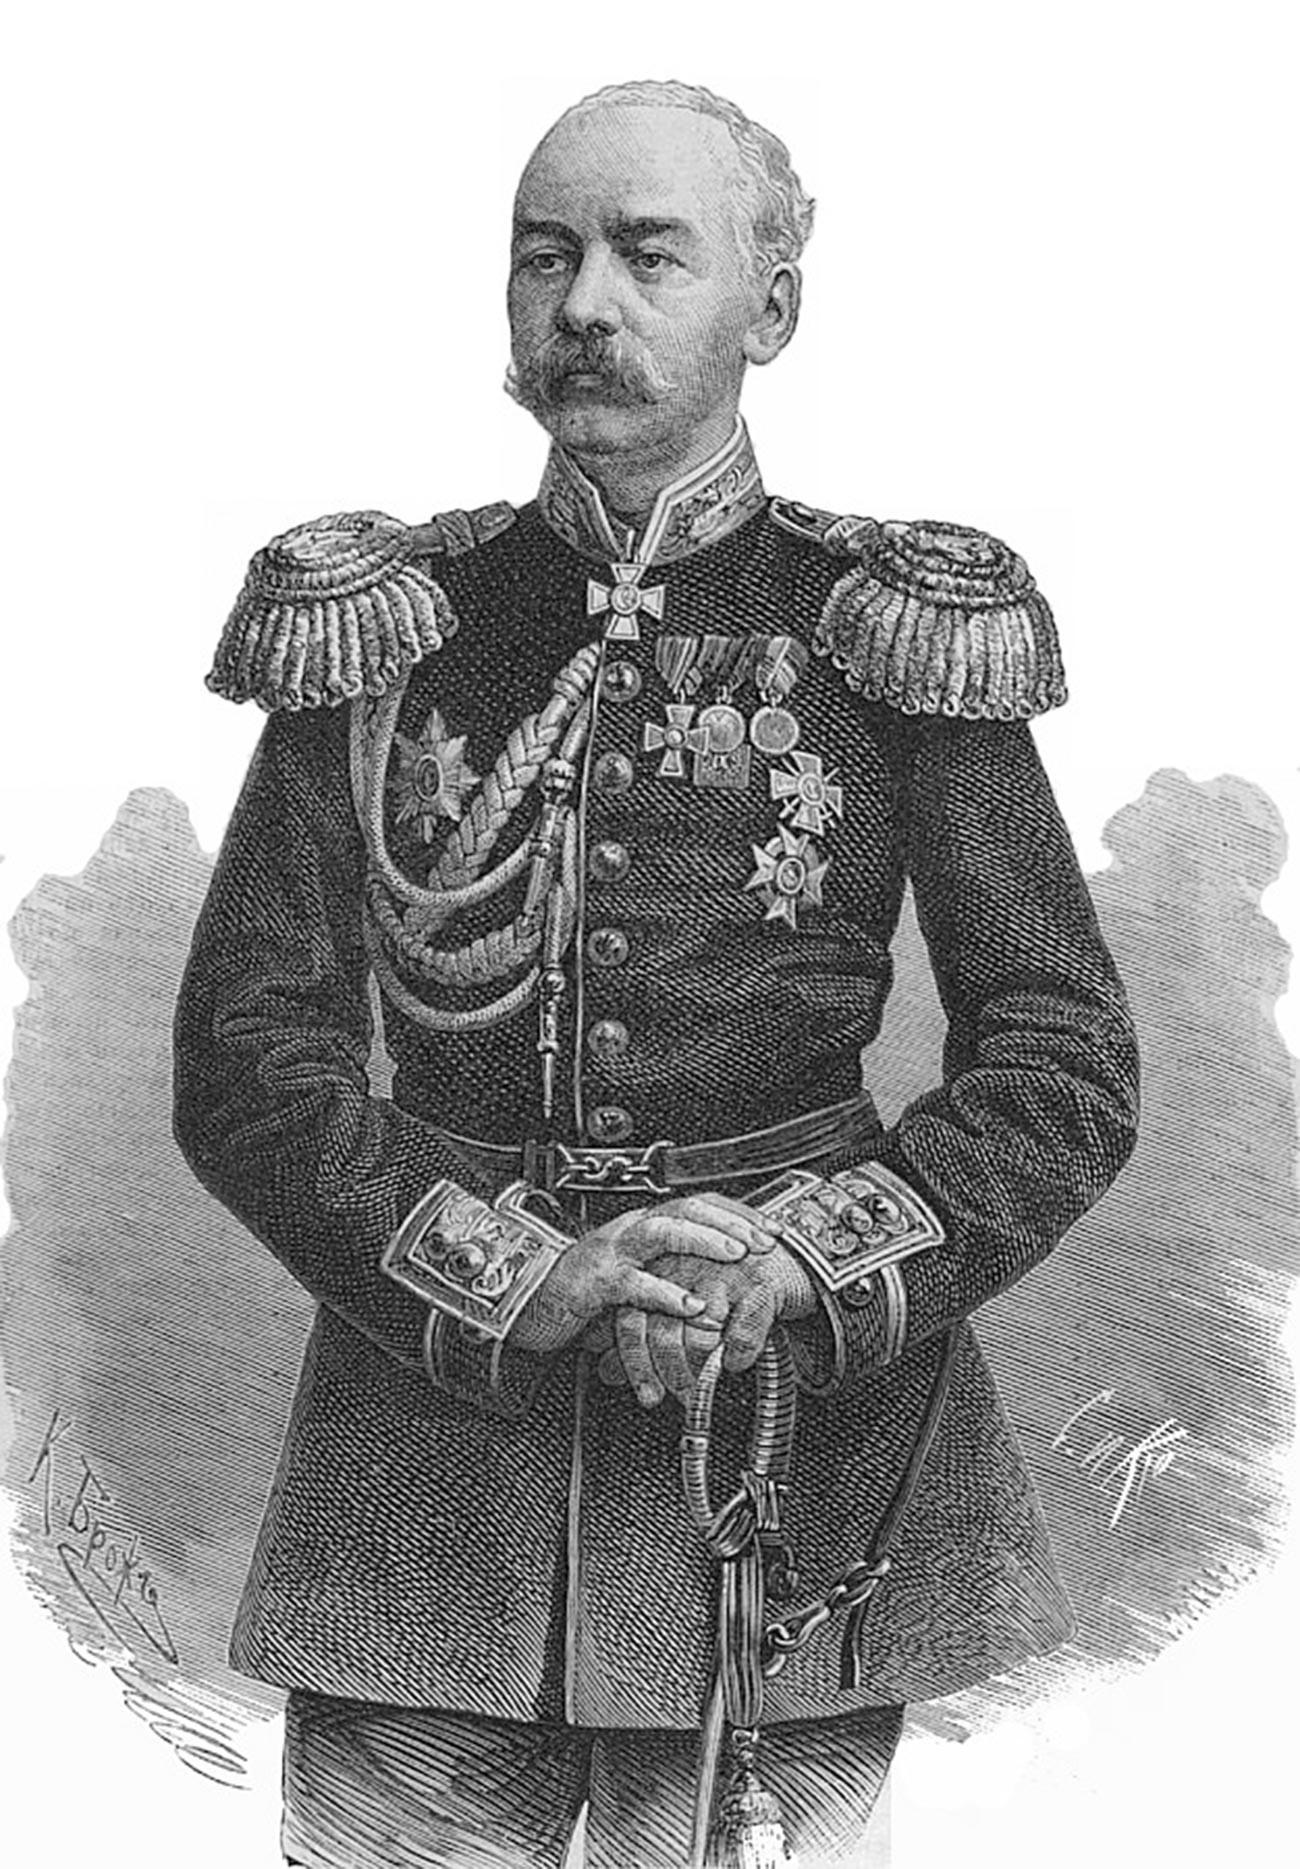 Konstantin Petrovich von Kaufman, generale russo, primo governatore del Turkestan